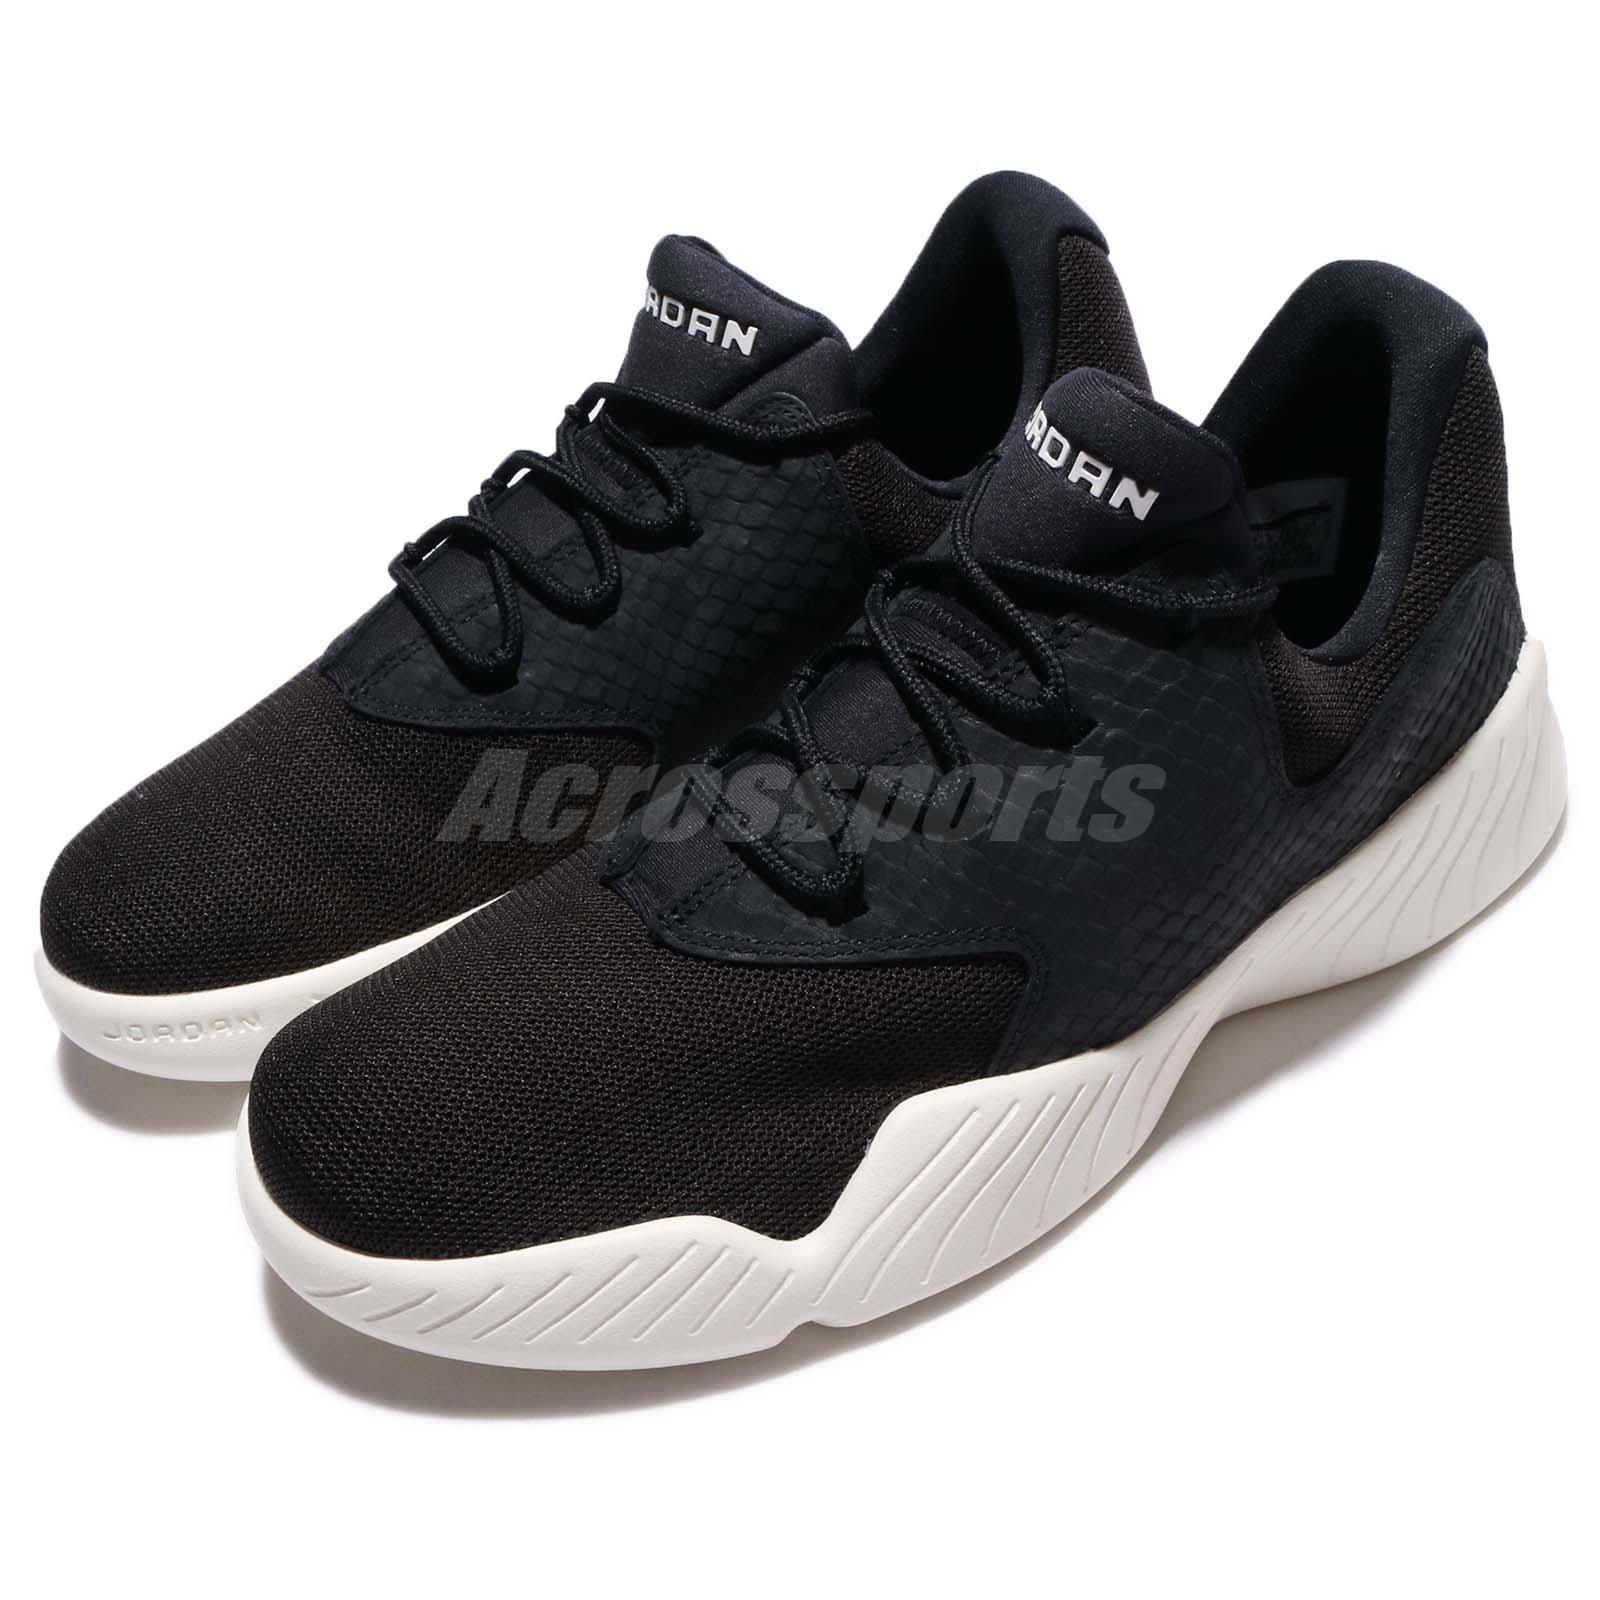 7d87d6eb711 Details about Nike Jordan J23 Low Black White Men Casual Shoes Sneakers  Slip-On 905288-011